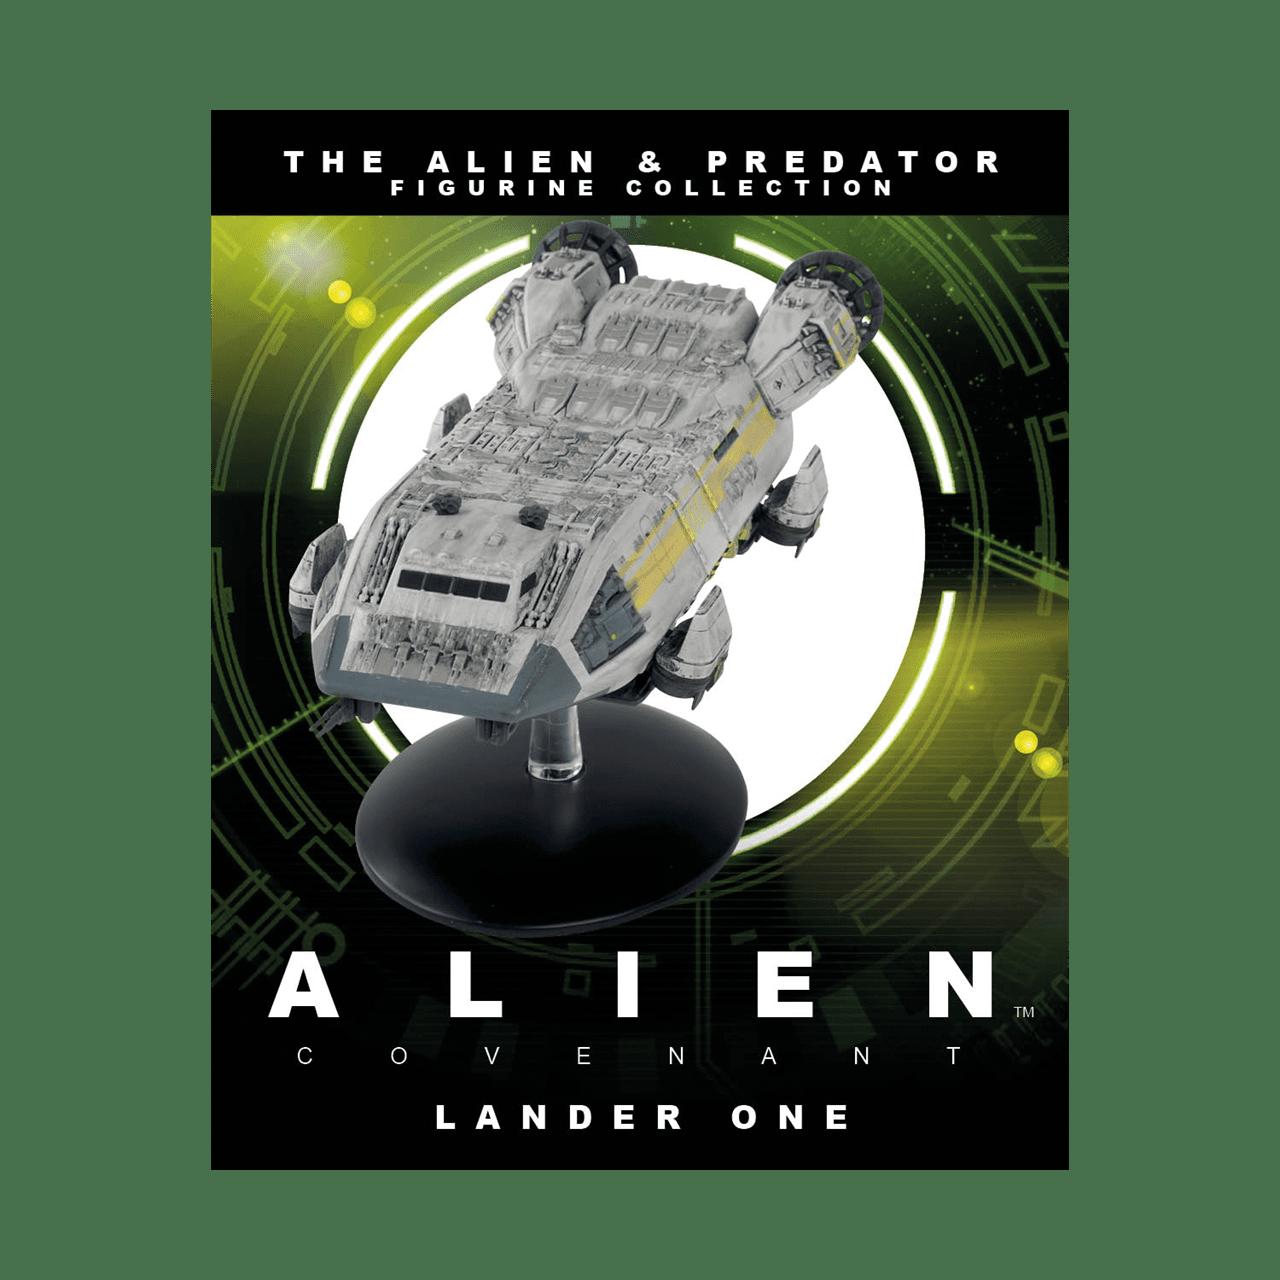 Alien Covenant: Lander One Ship Hero Collector - 3